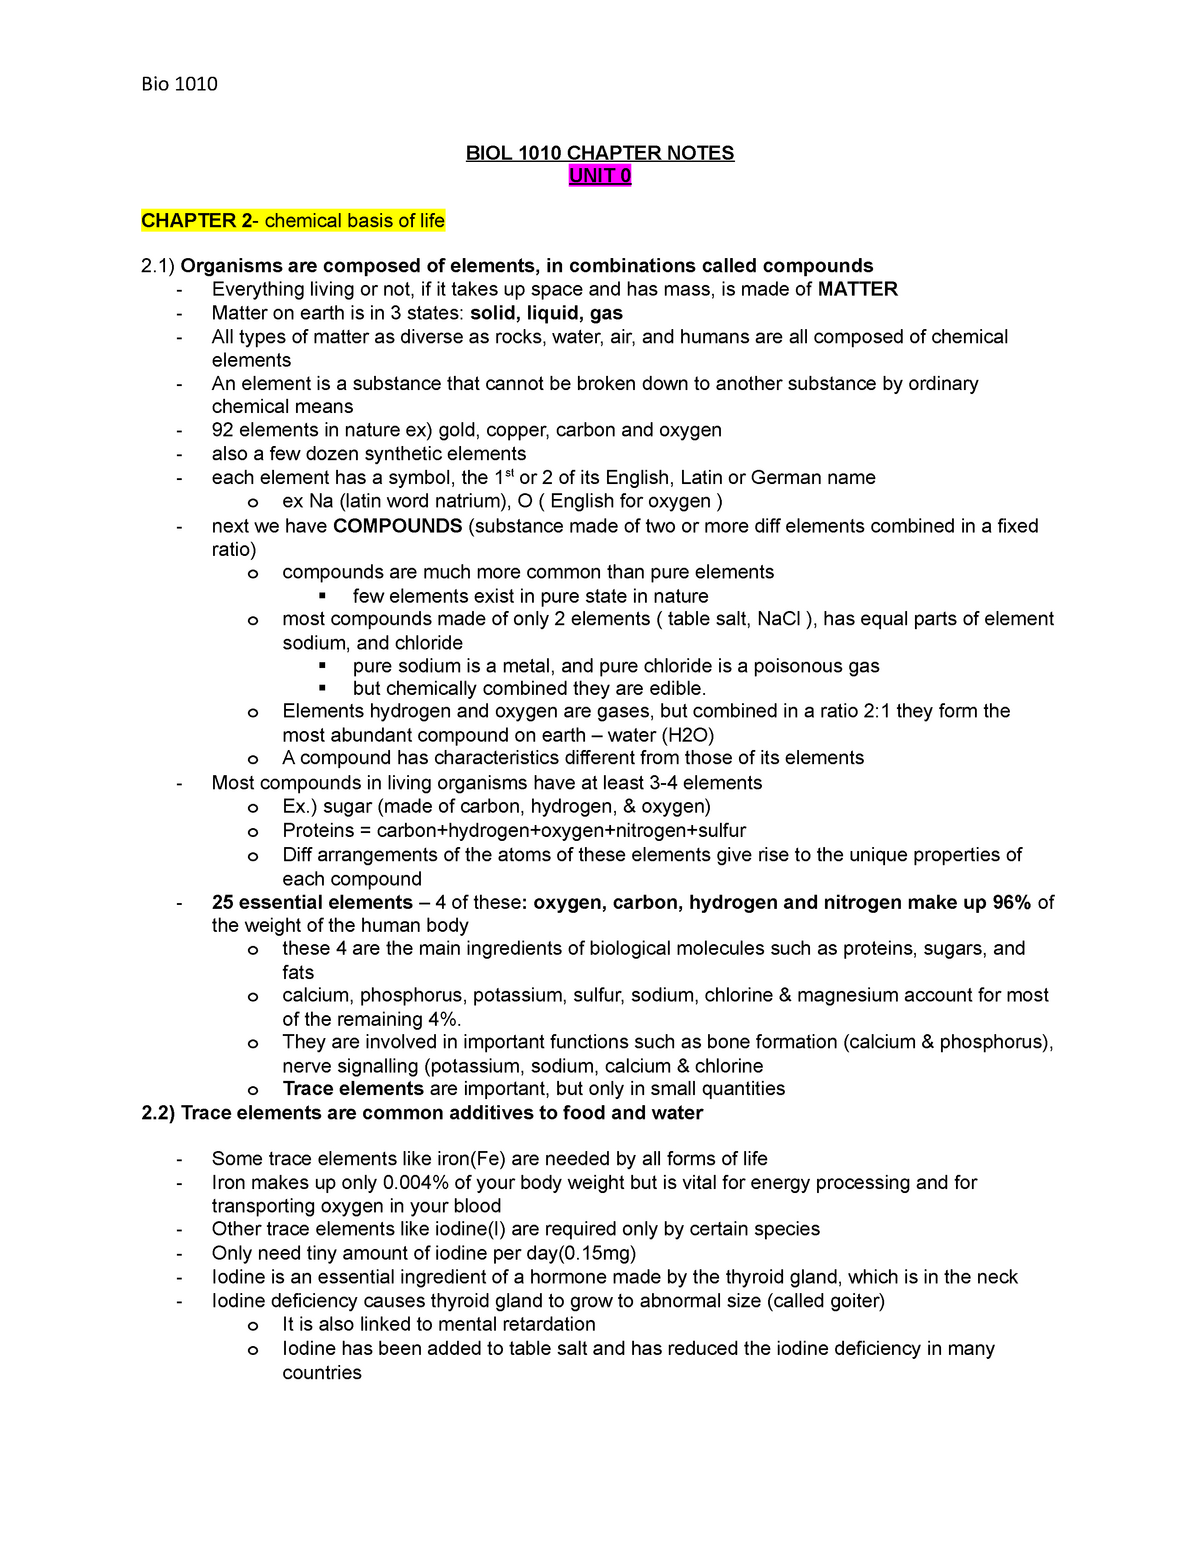 23 Carbon Compounds Worksheet Answers   Worksheet List